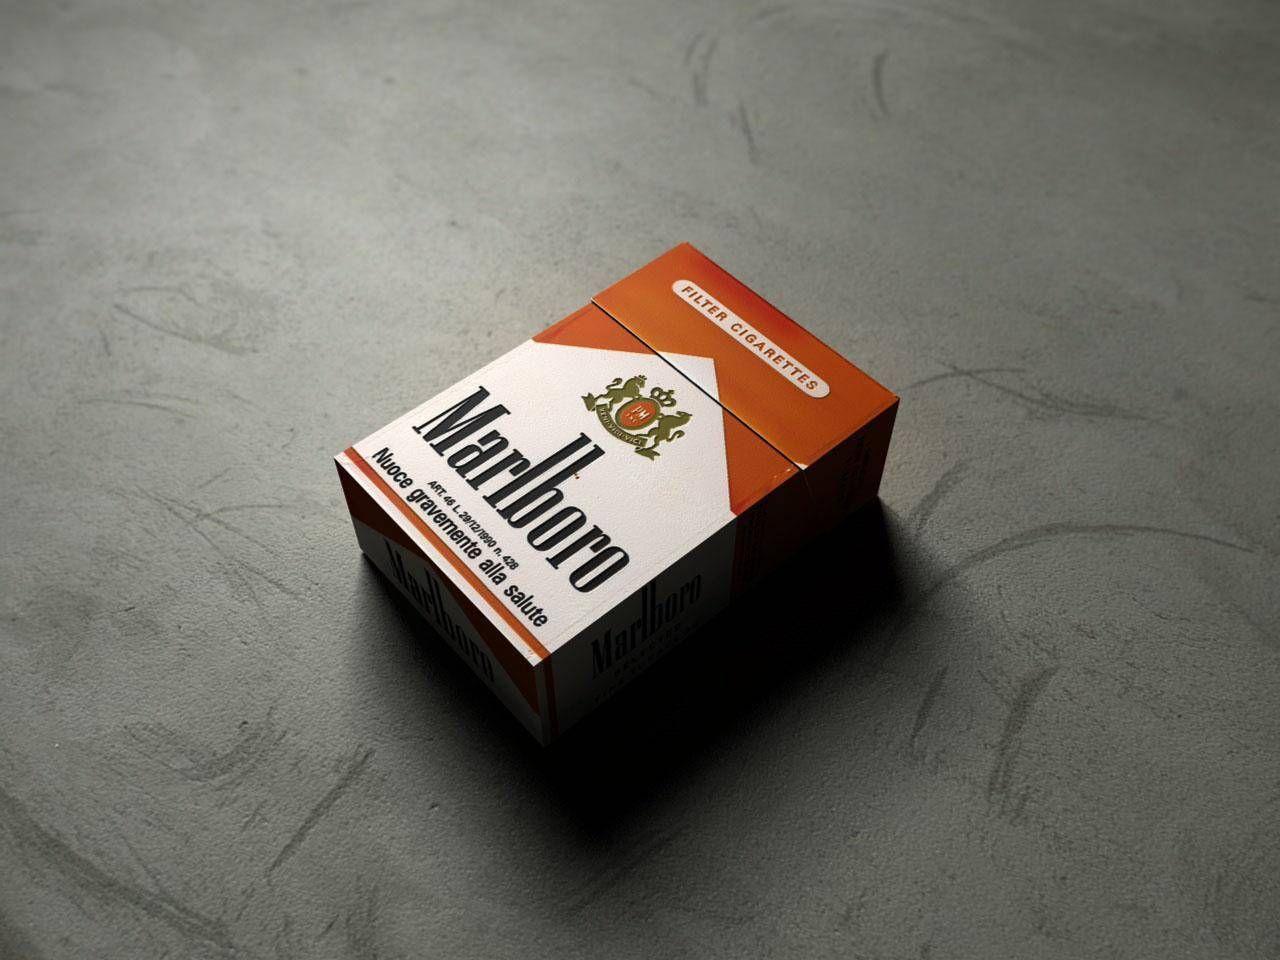 Buy cigarettes Camel online reviews